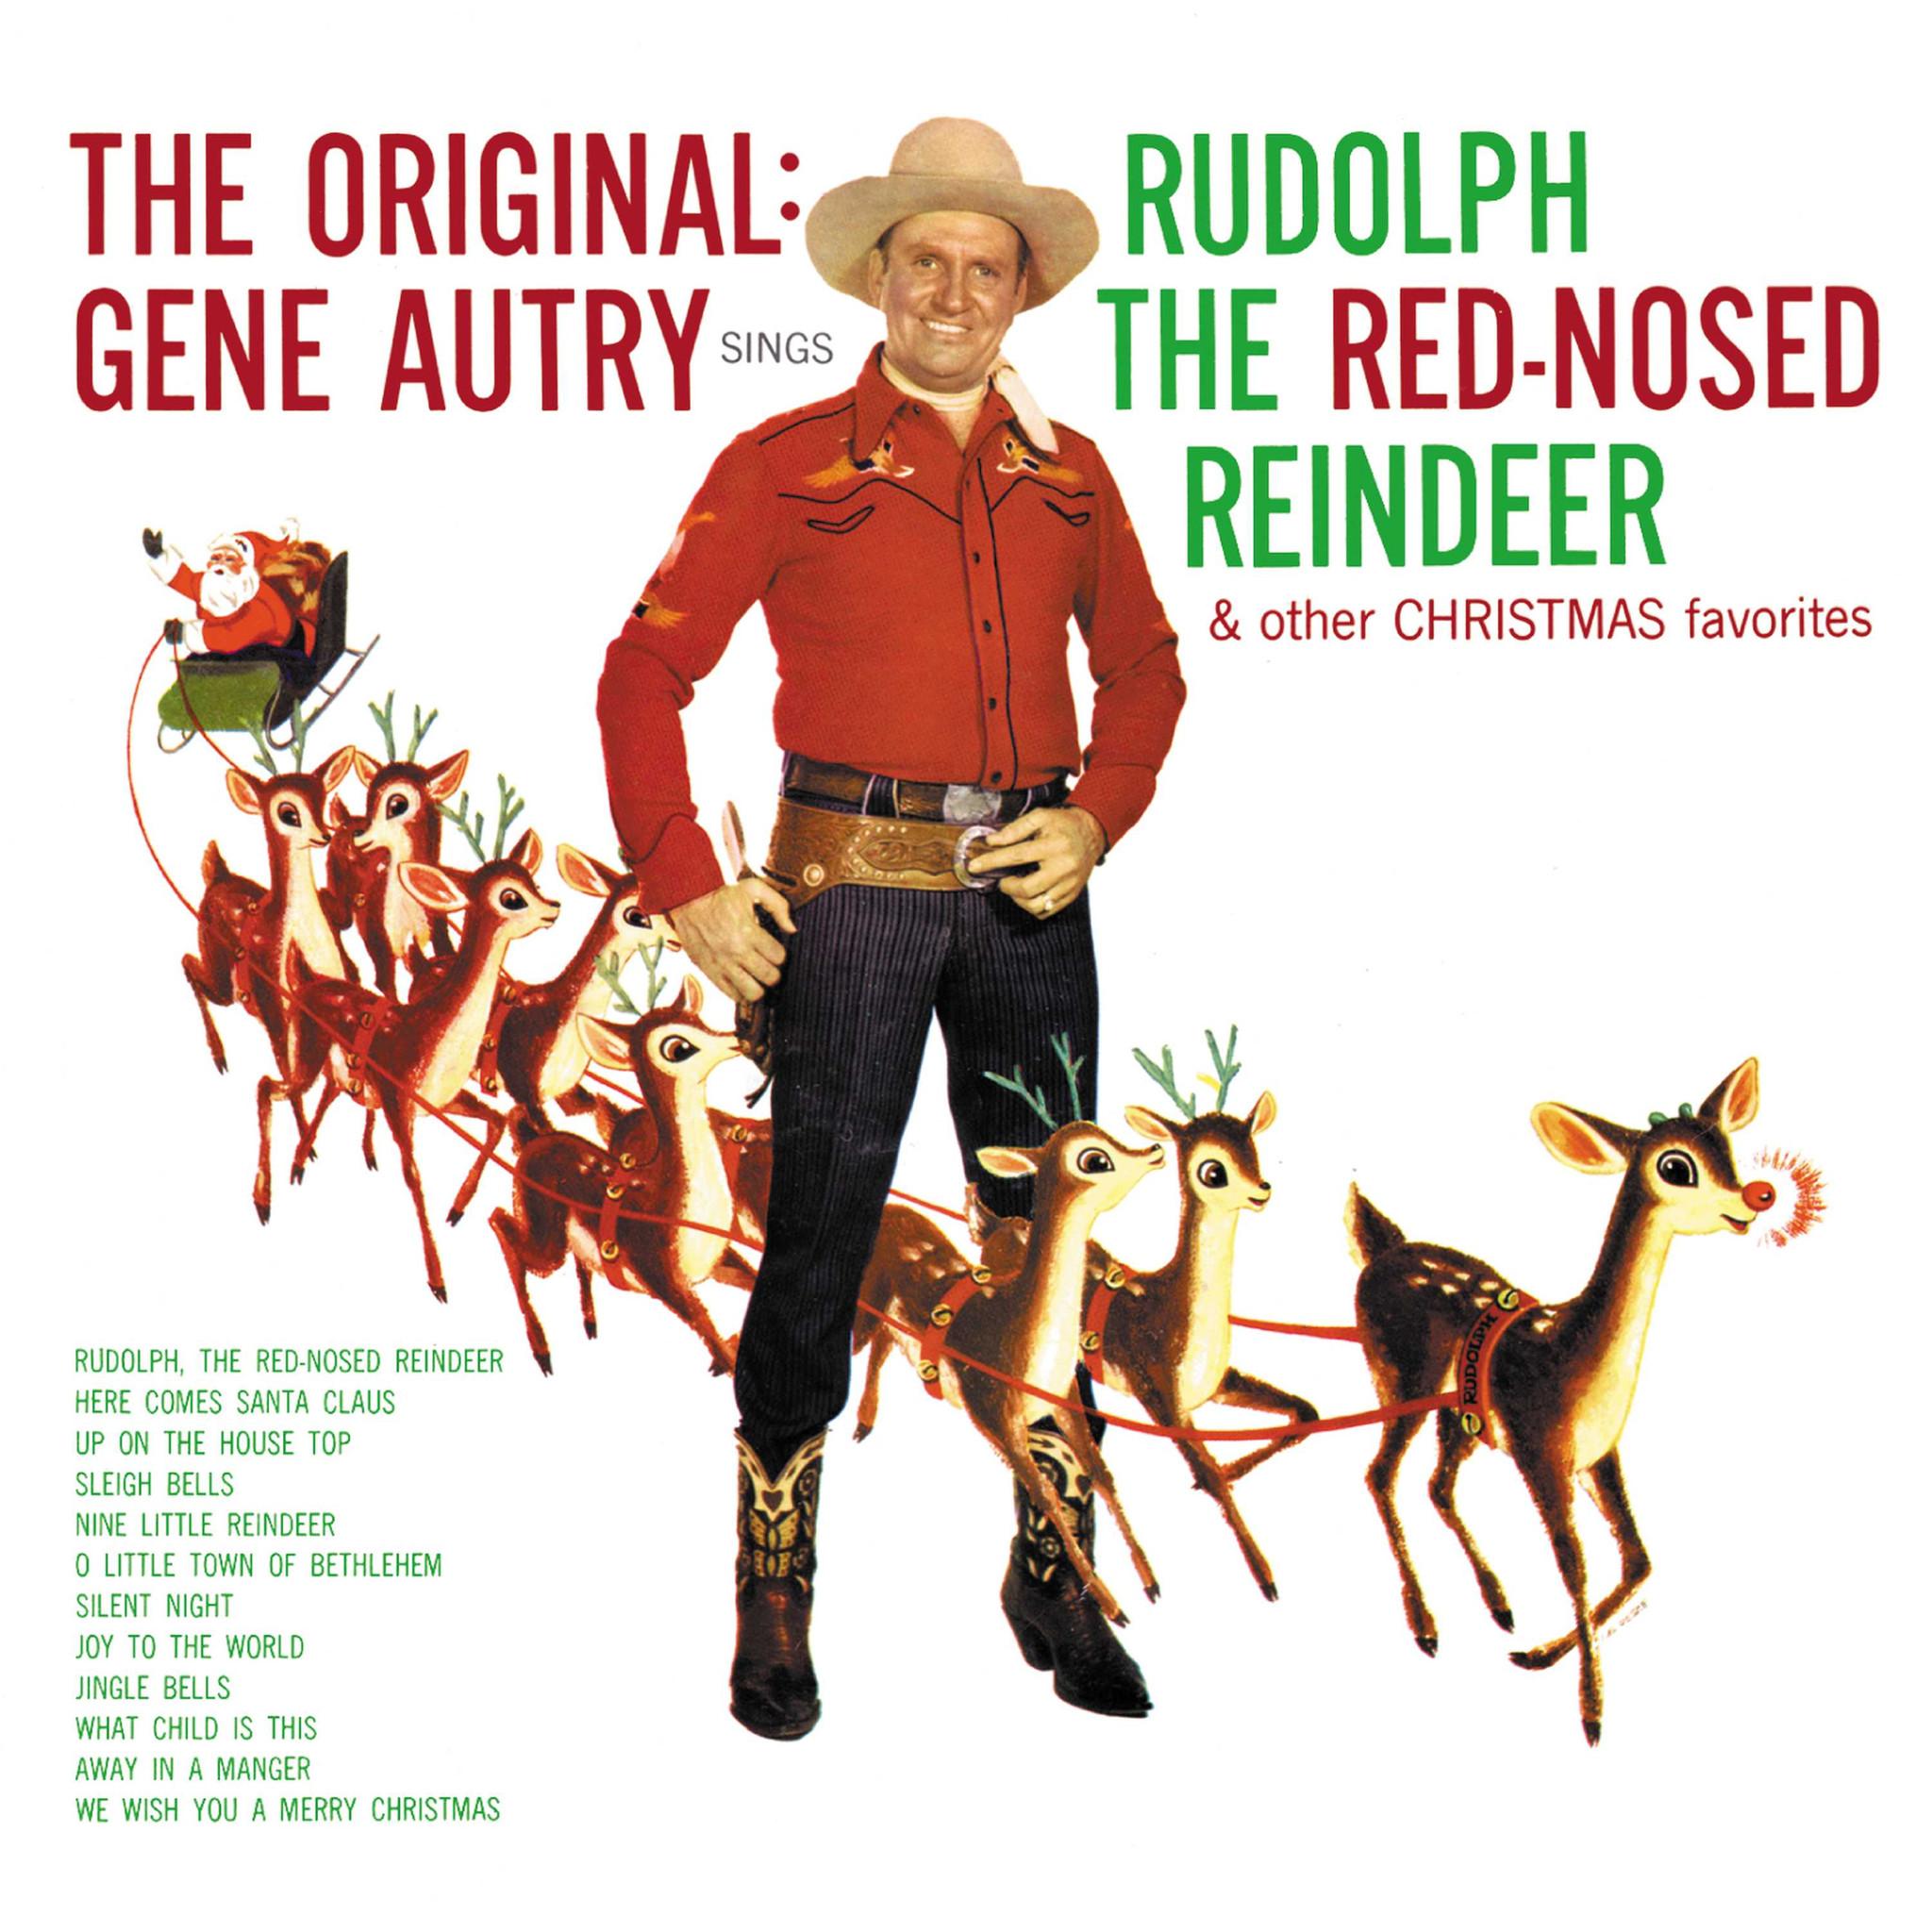 Rudolph the Red-nosed Reindeer - Gene Autry - Musik - VARESE SARABANDE - 0030206675825 - September 26, 2006